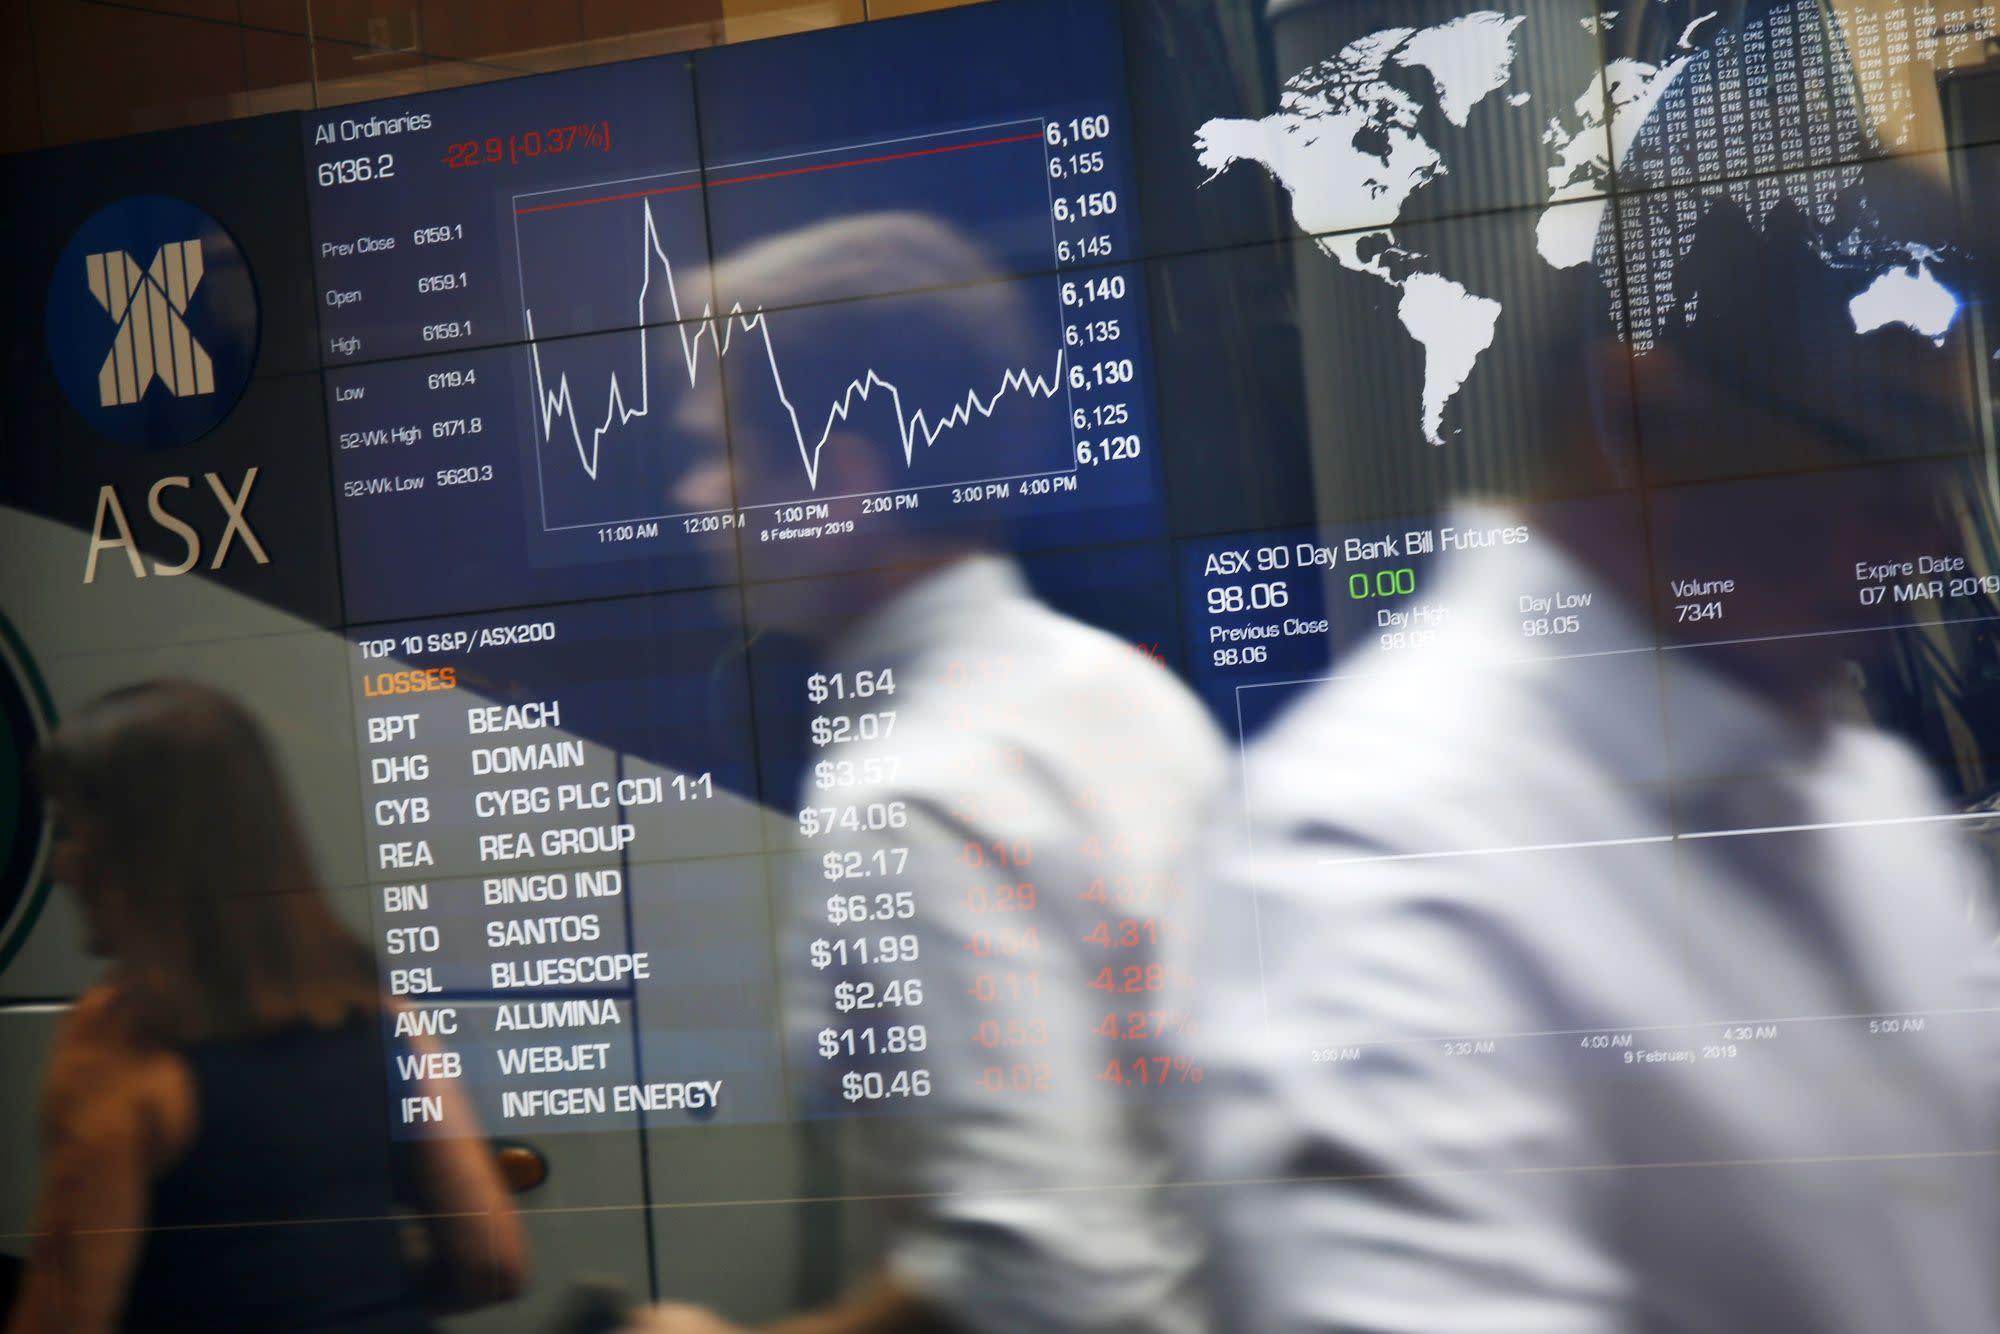 ACL Seeks $25 Million in Australia's Biggest IPO So Far in 25